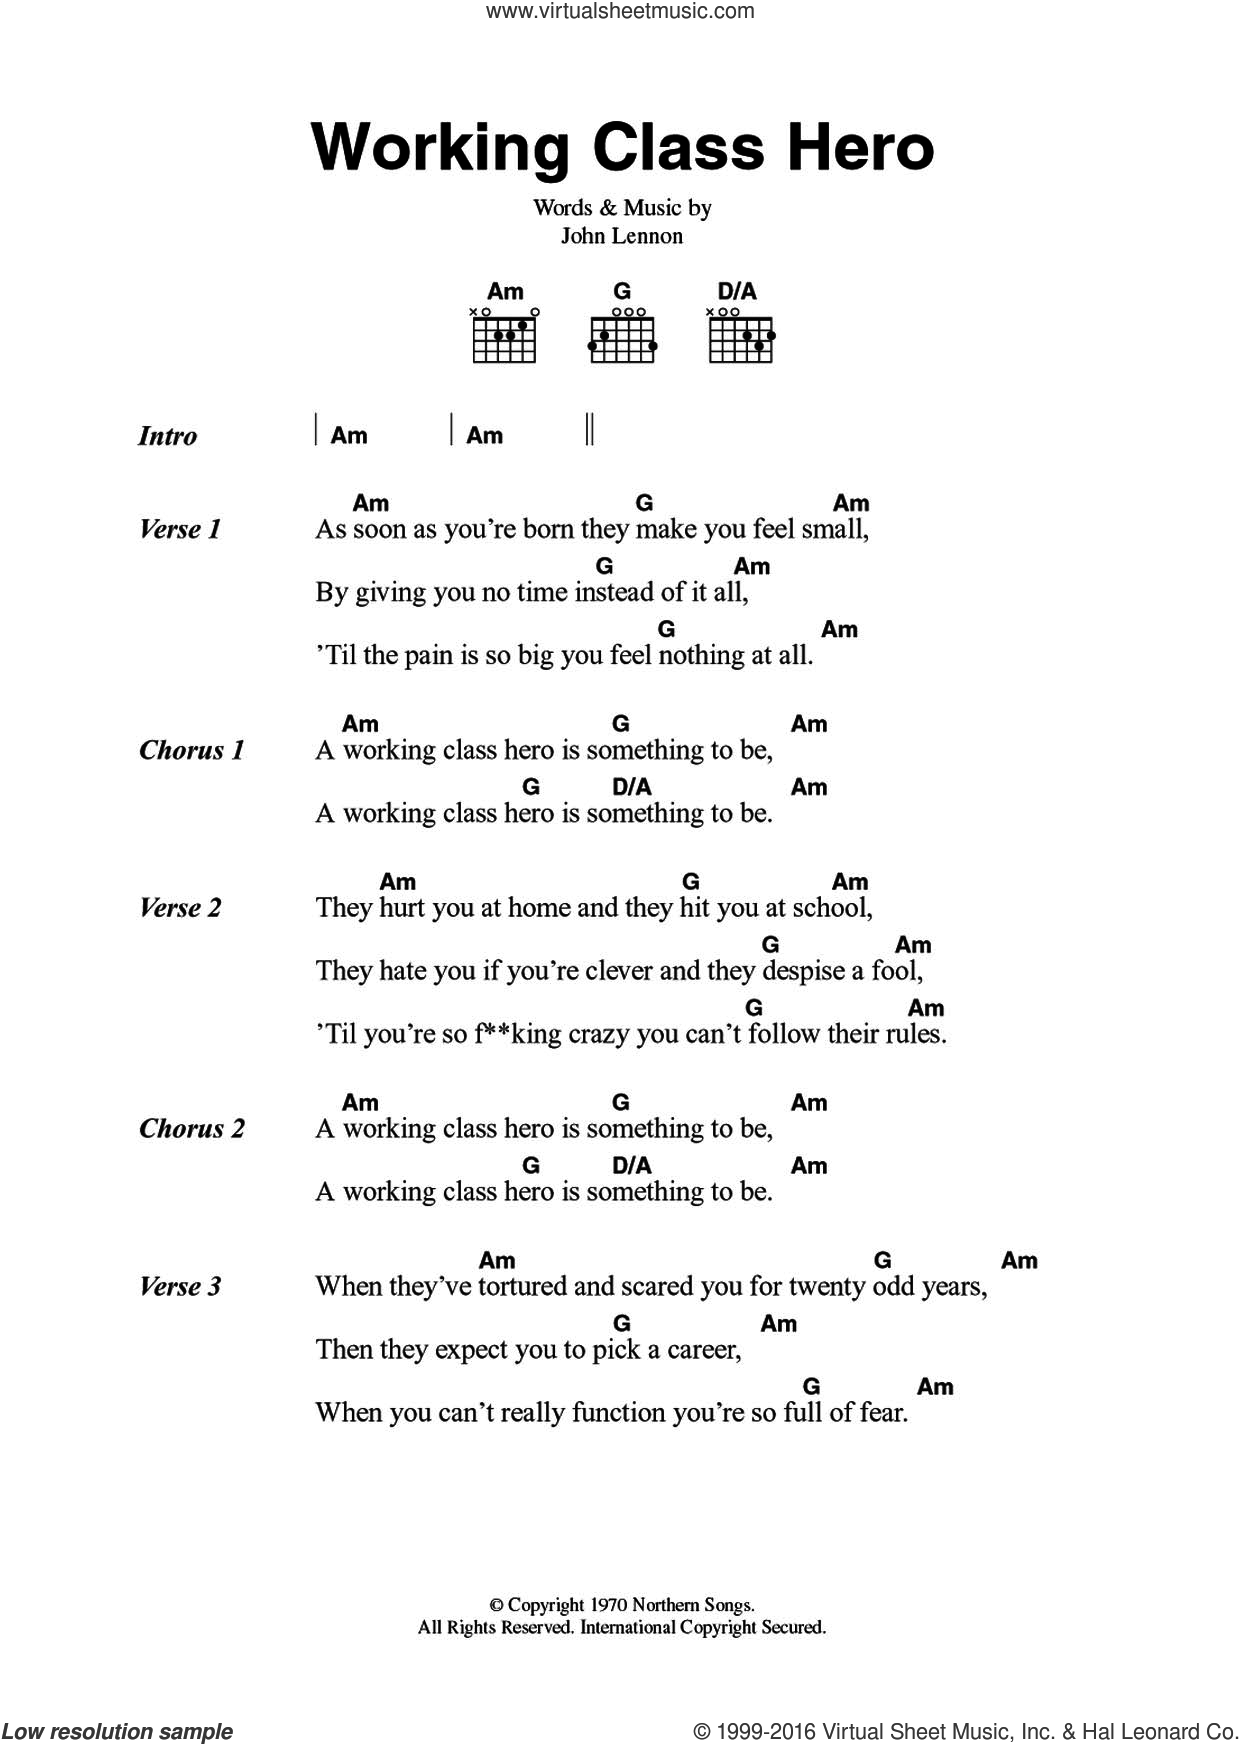 Working Class Hero sheet music for guitar (chords) by John Lennon, intermediate skill level